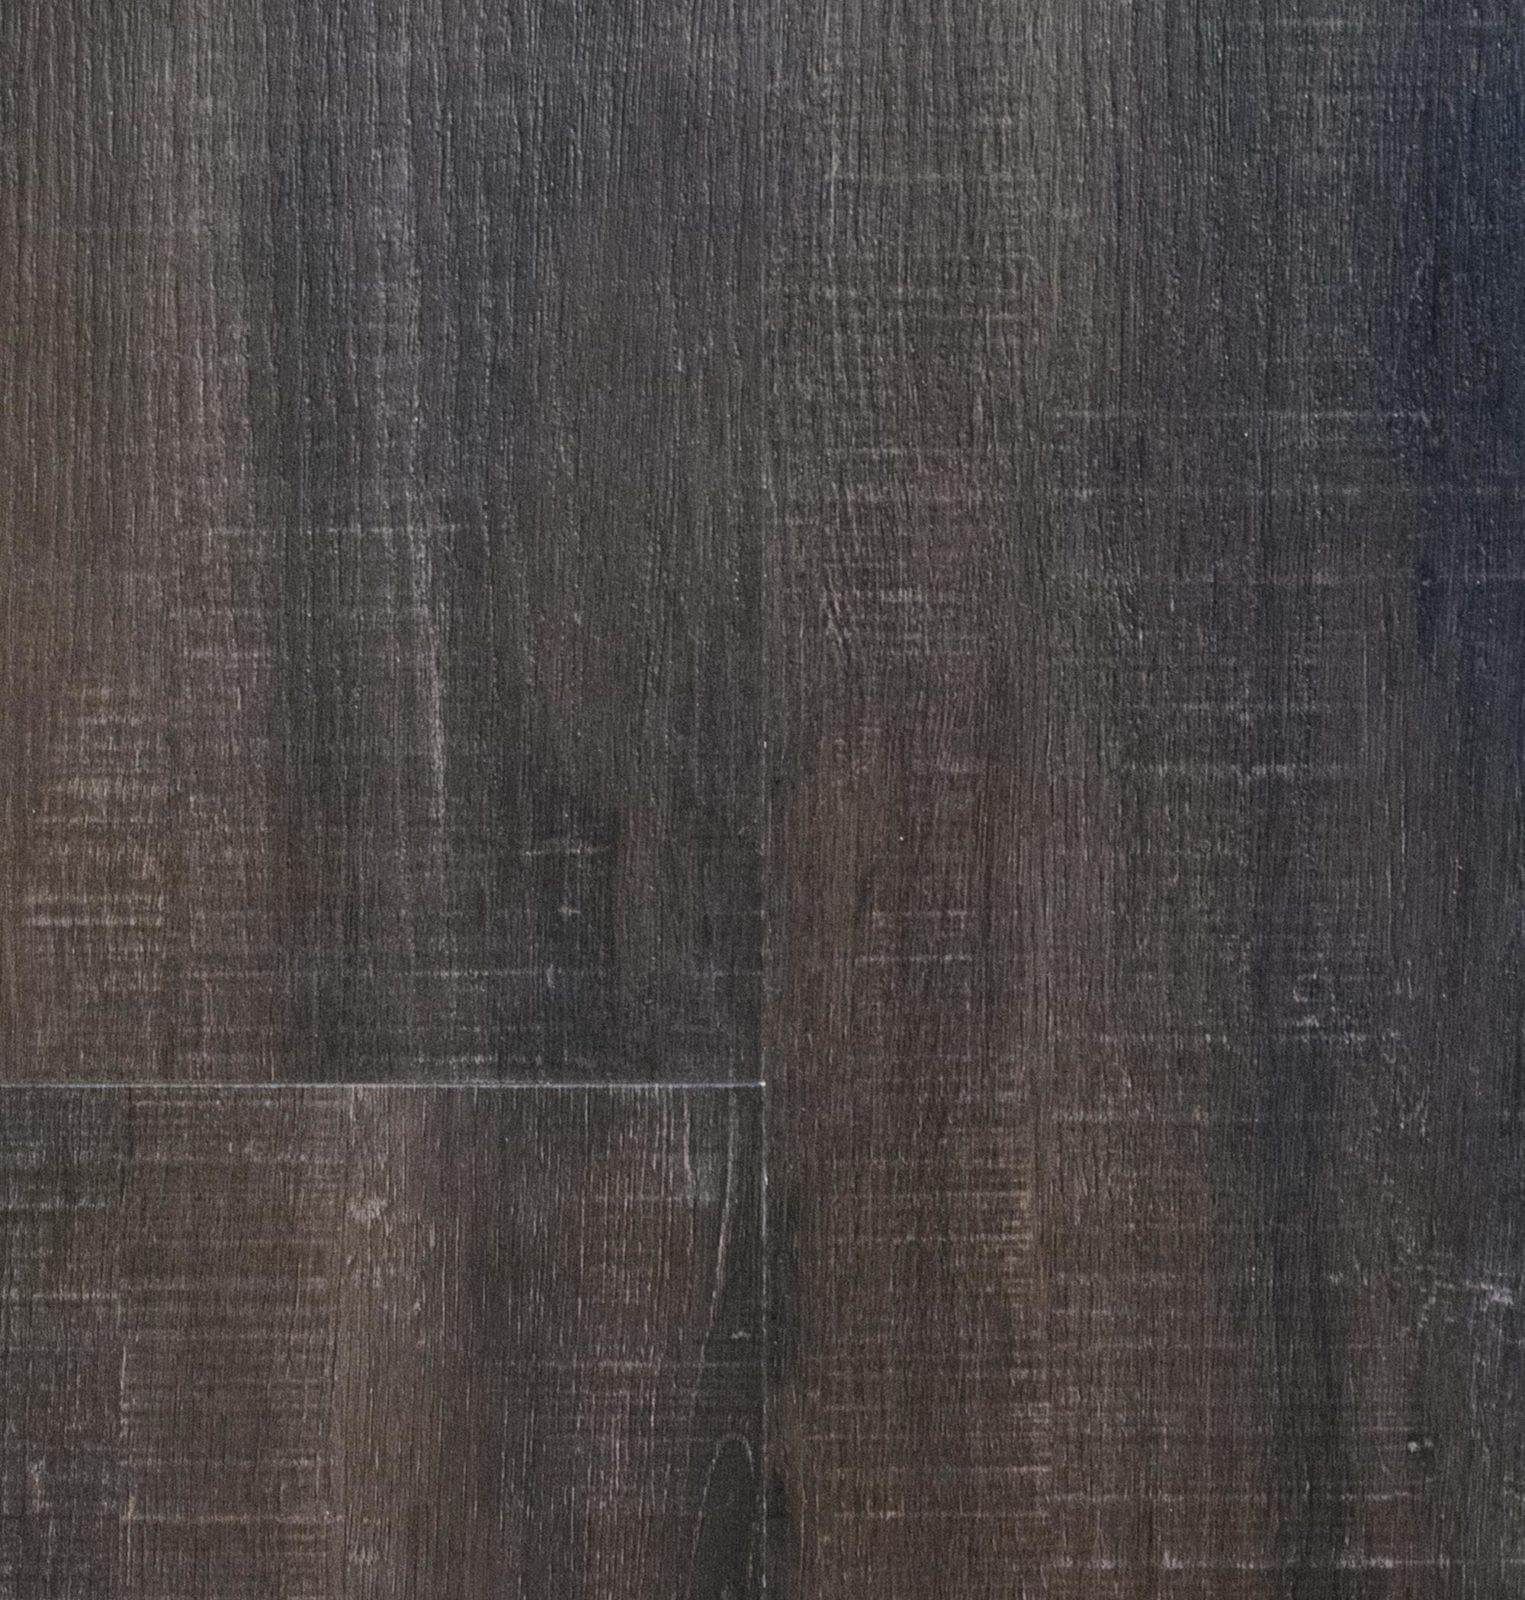 Mohawk premium vinyl plank flooring flooring designs for Mohawk vinyl flooring